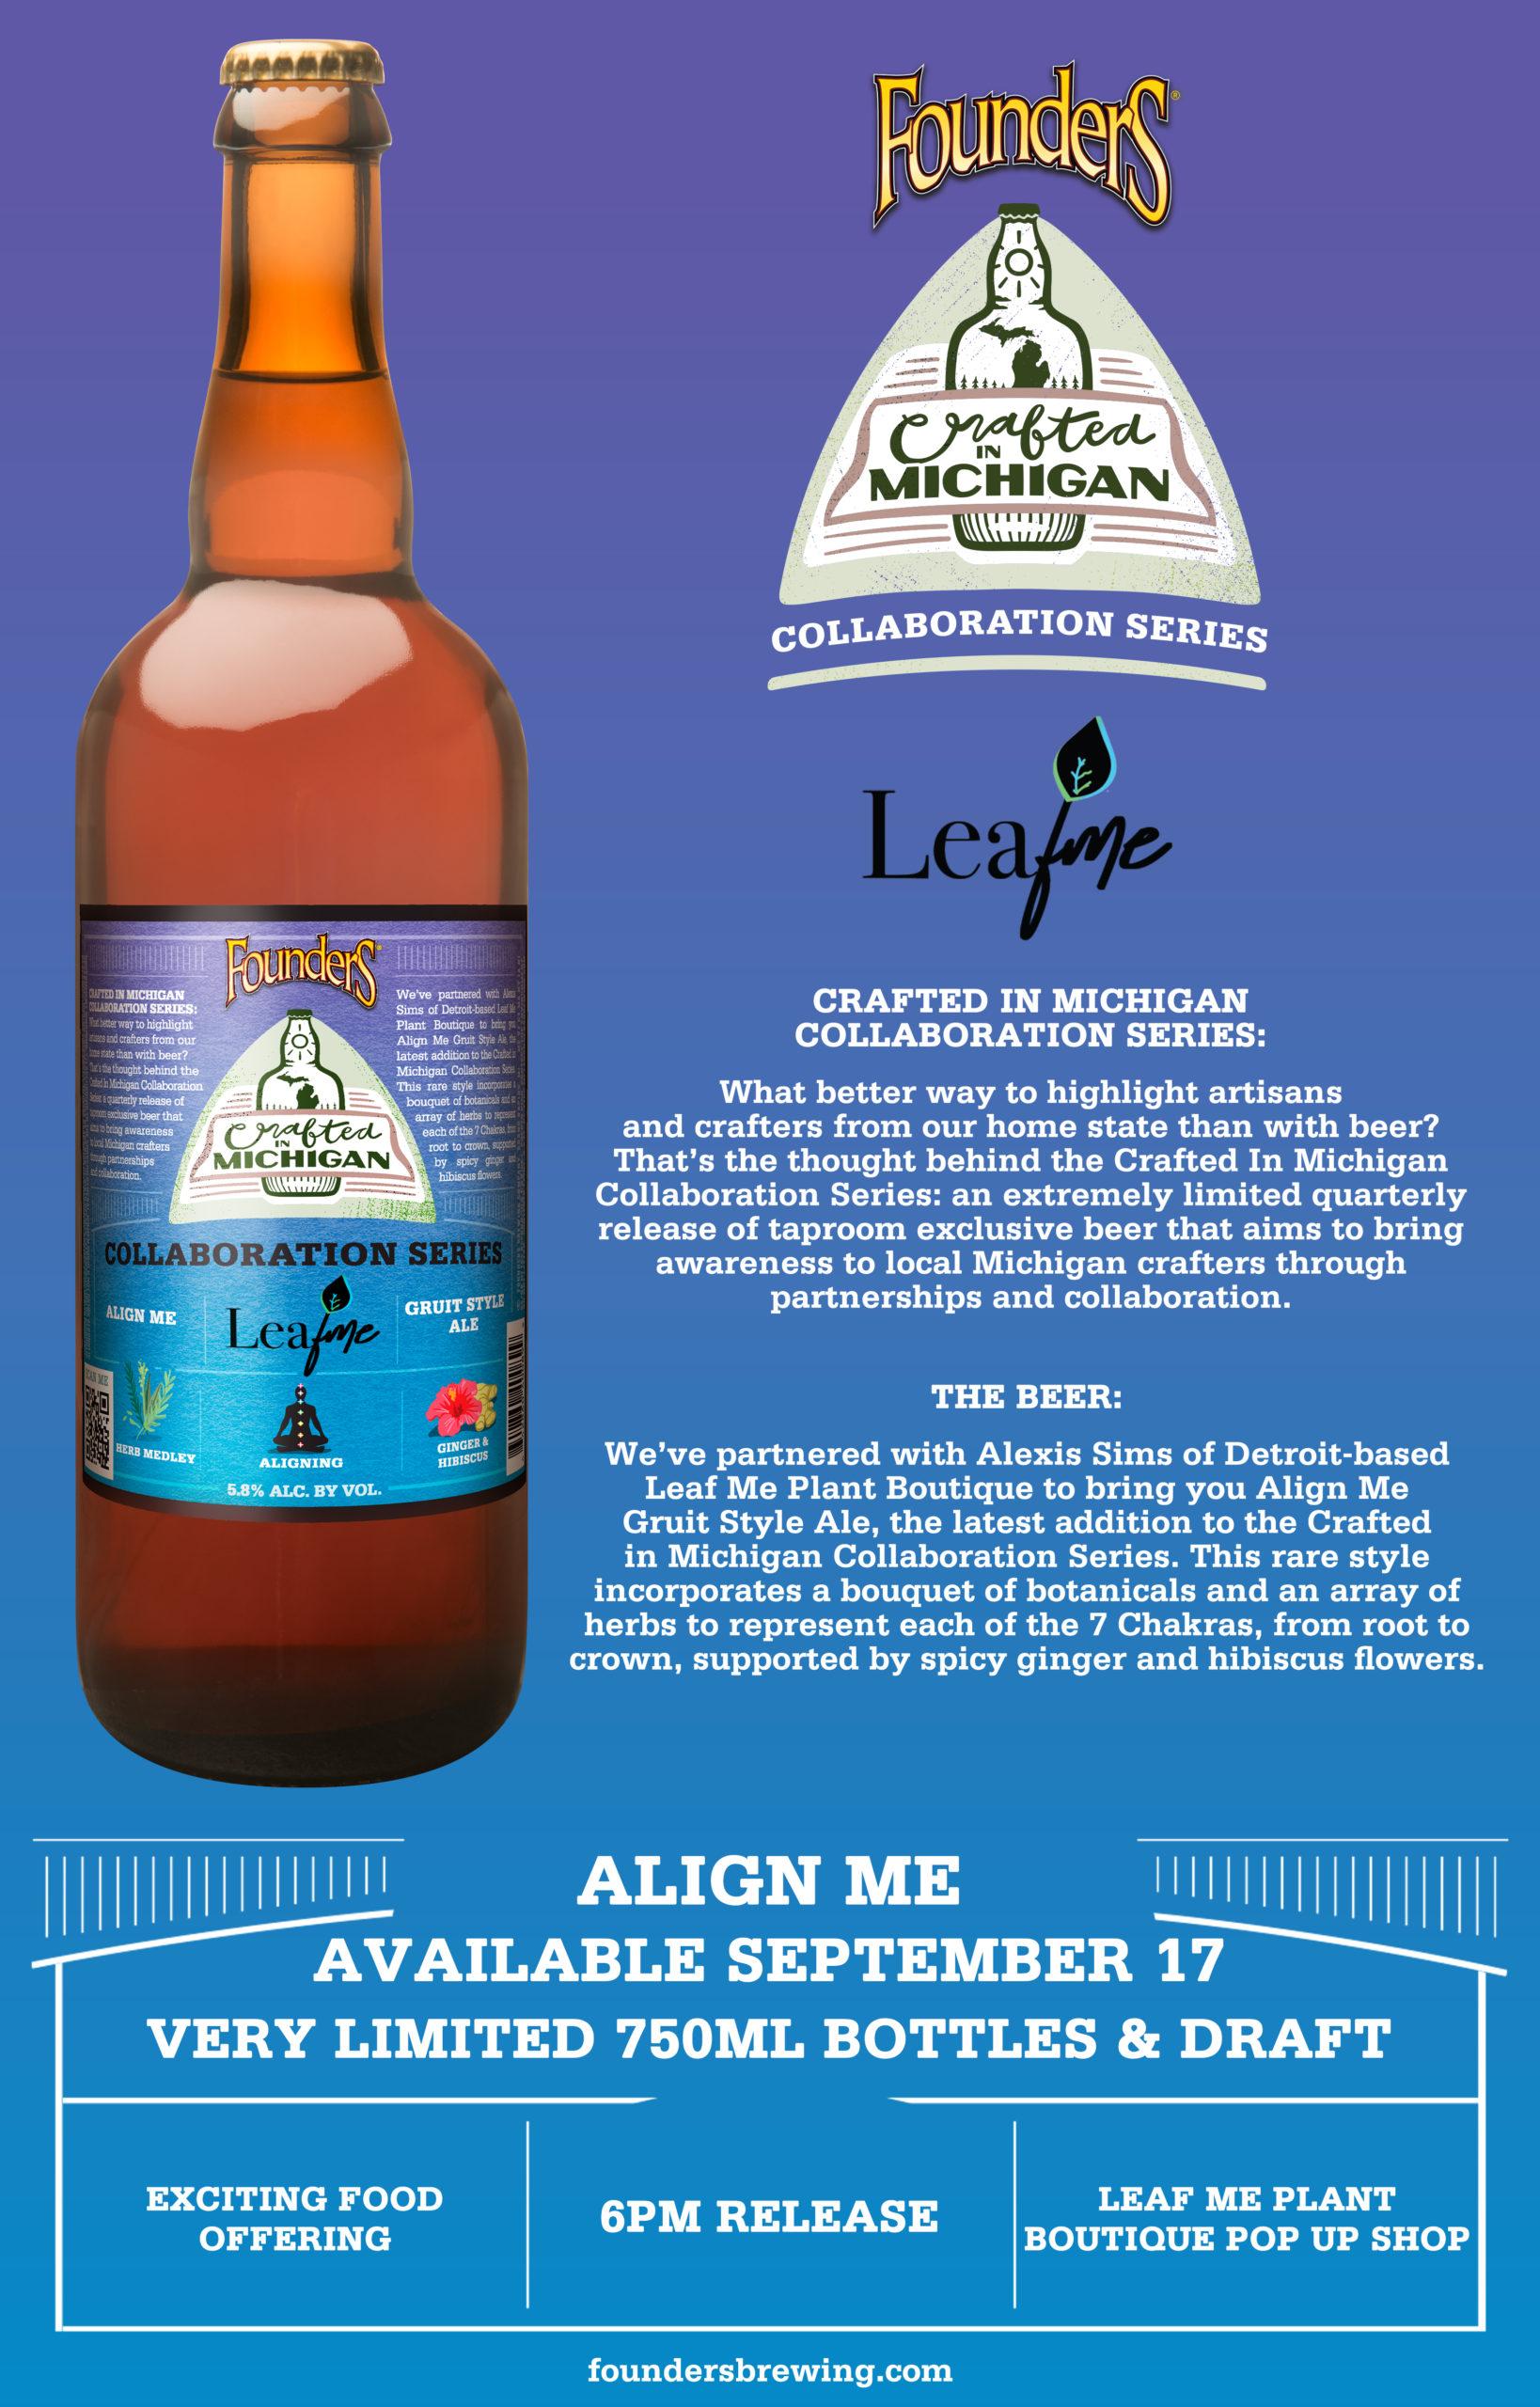 Align Me release September 17 at 6pm